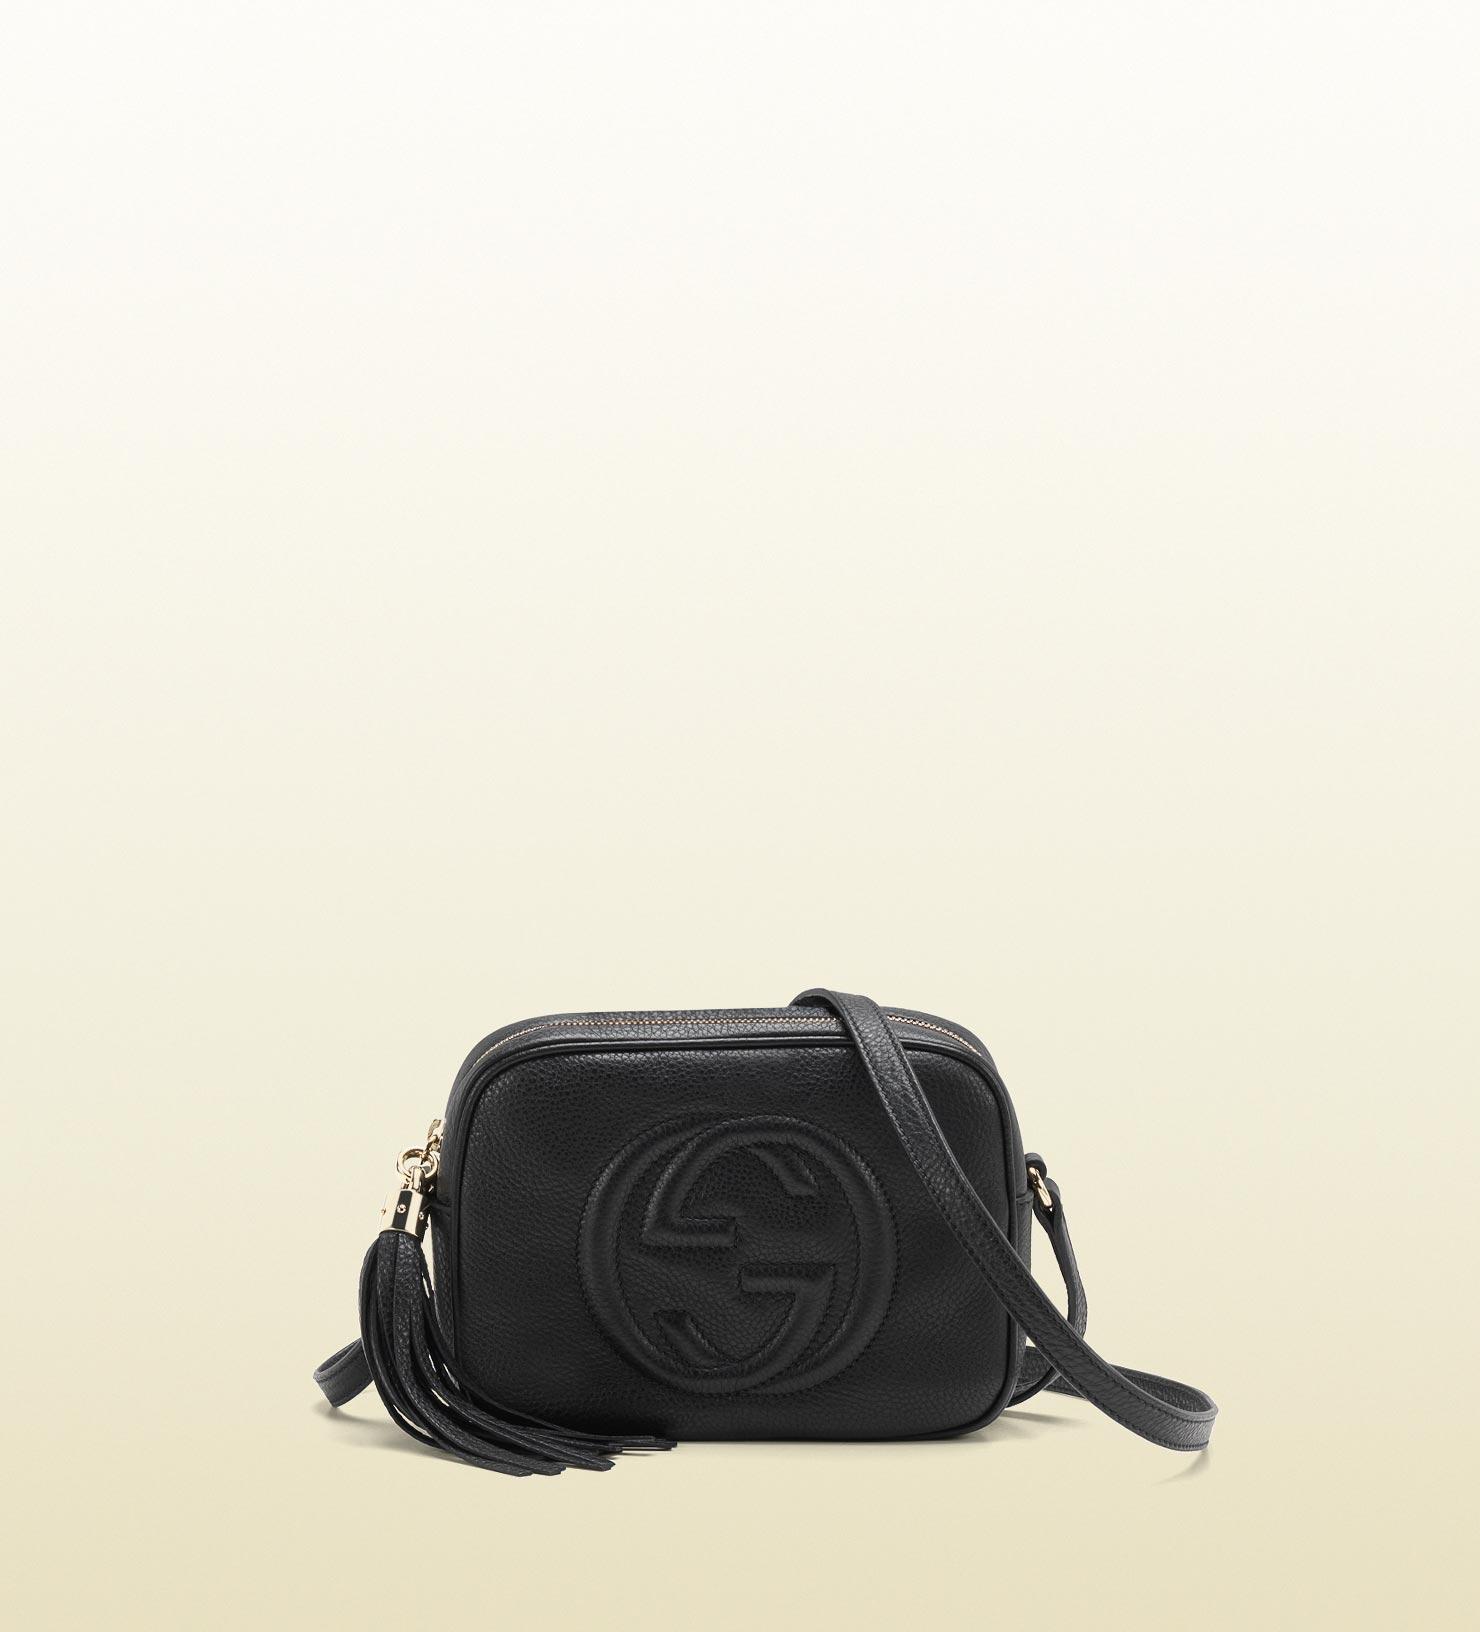 Gucci -  soho disco bag 308364A7M0G1000